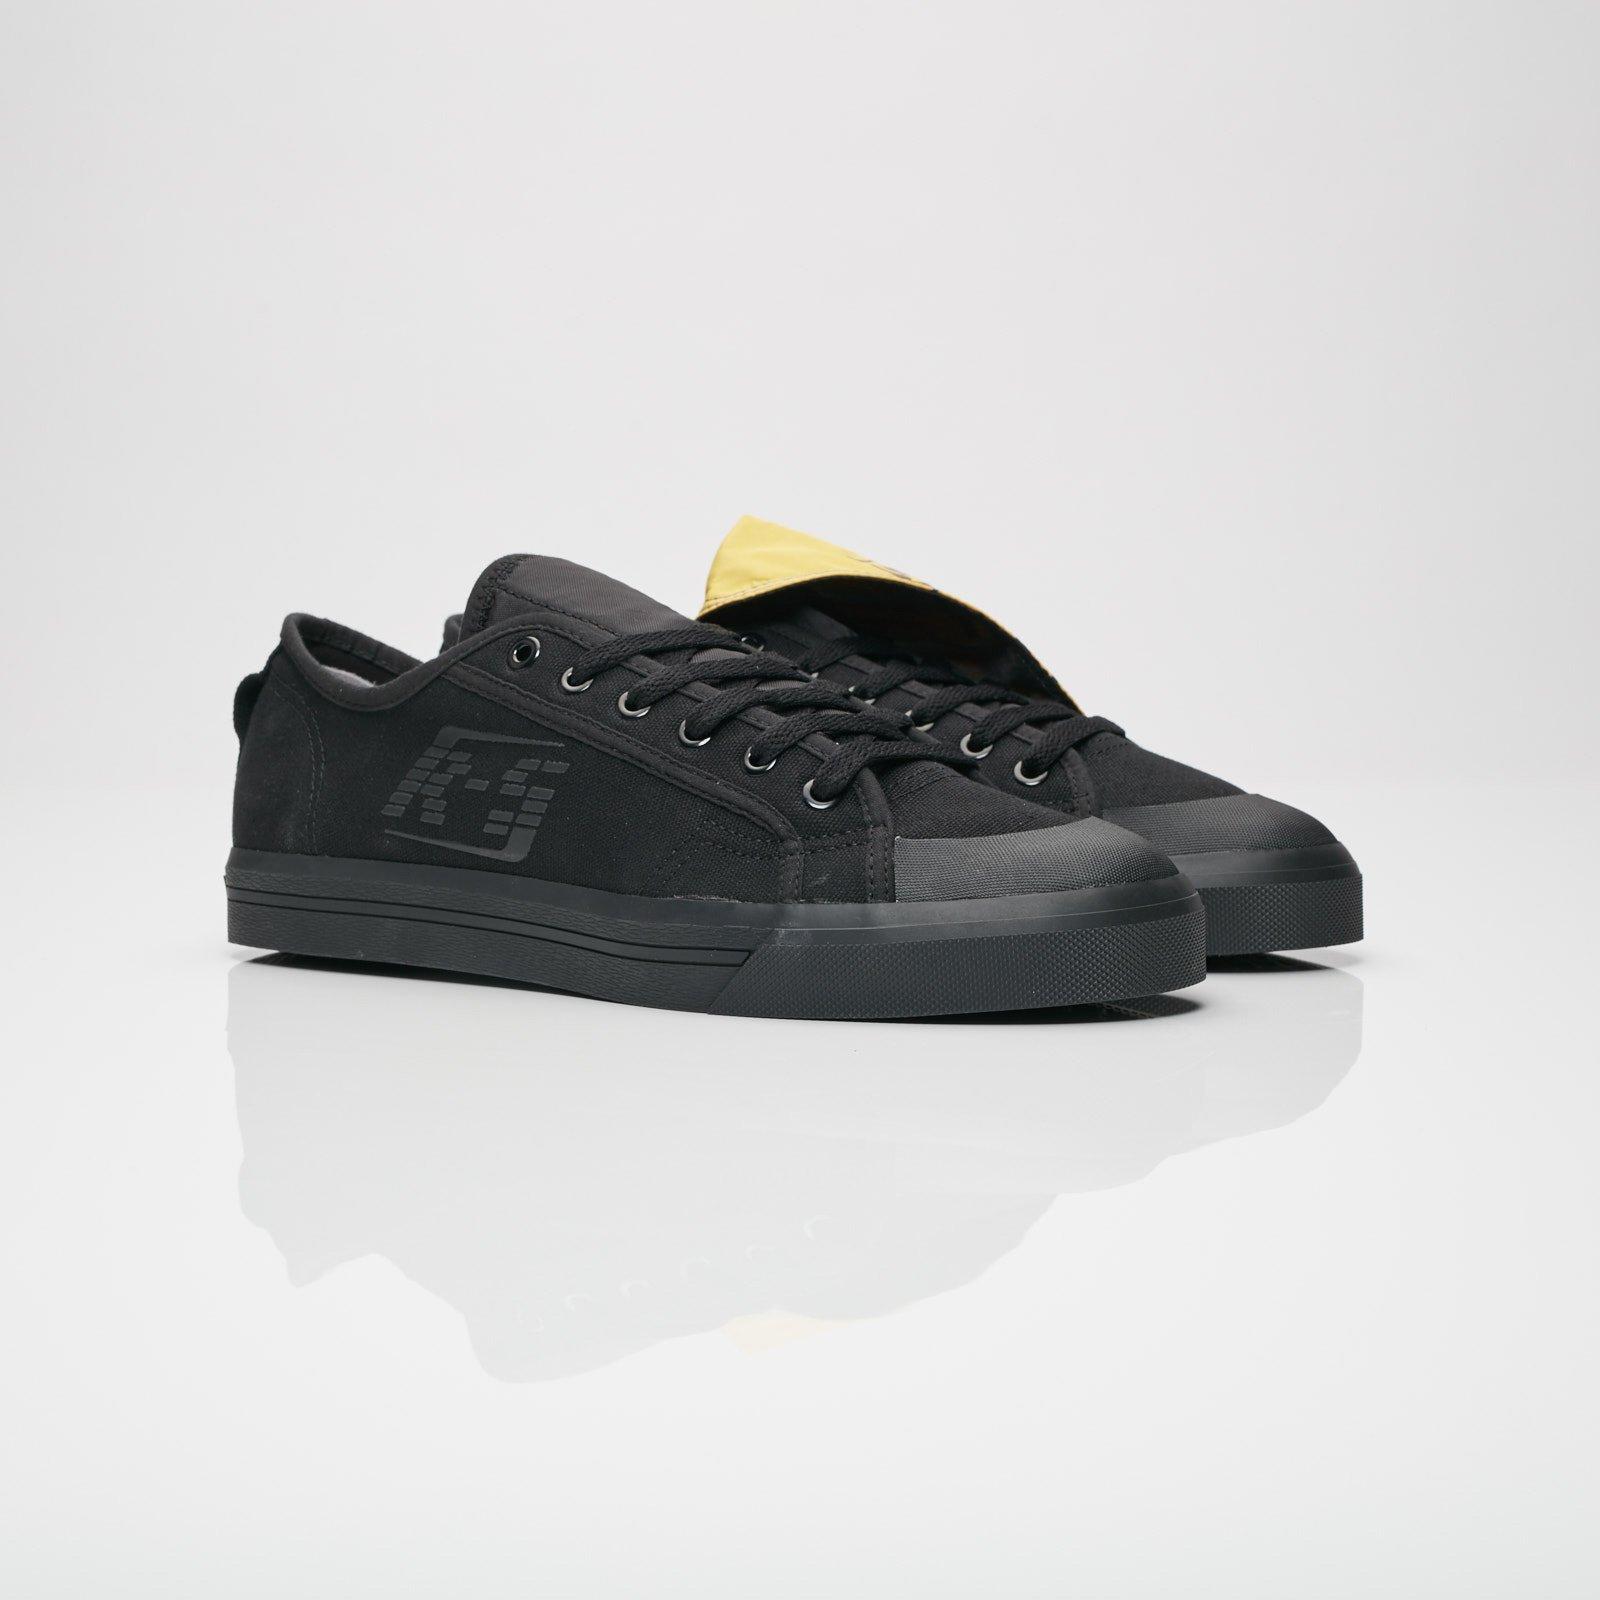 Converse Black & Yellow adidas Originals Edition Spirit Low Sneakers dLA2P